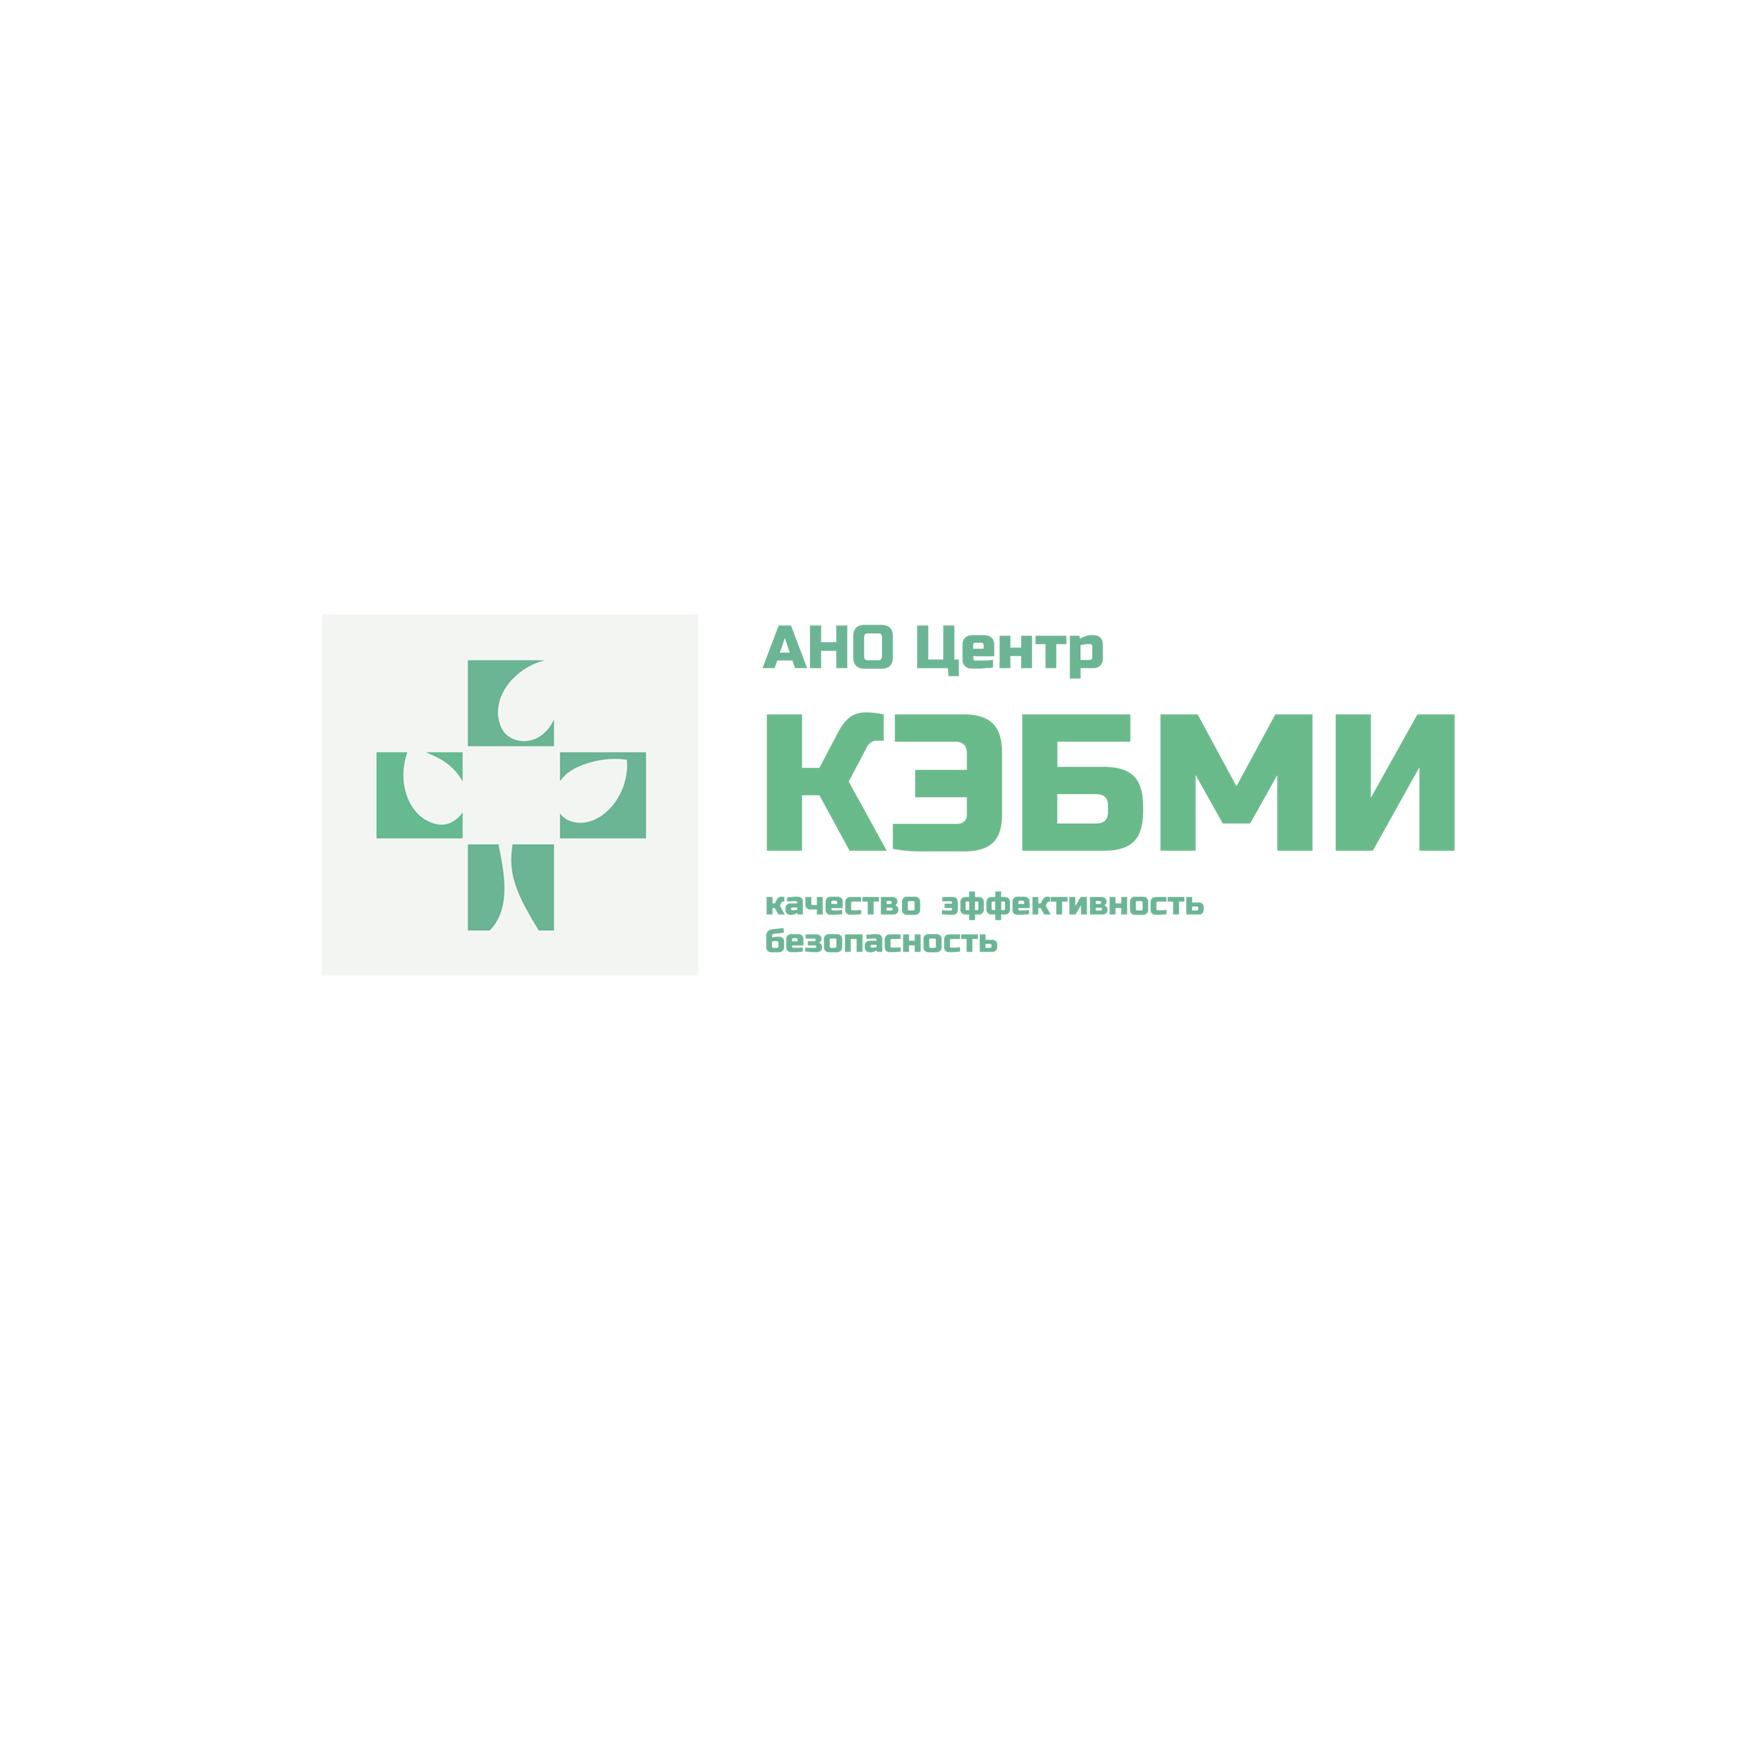 Редизайн логотипа АНО Центр КЭБМИ - BREVIS фото f_4935b29667e1de86.jpg